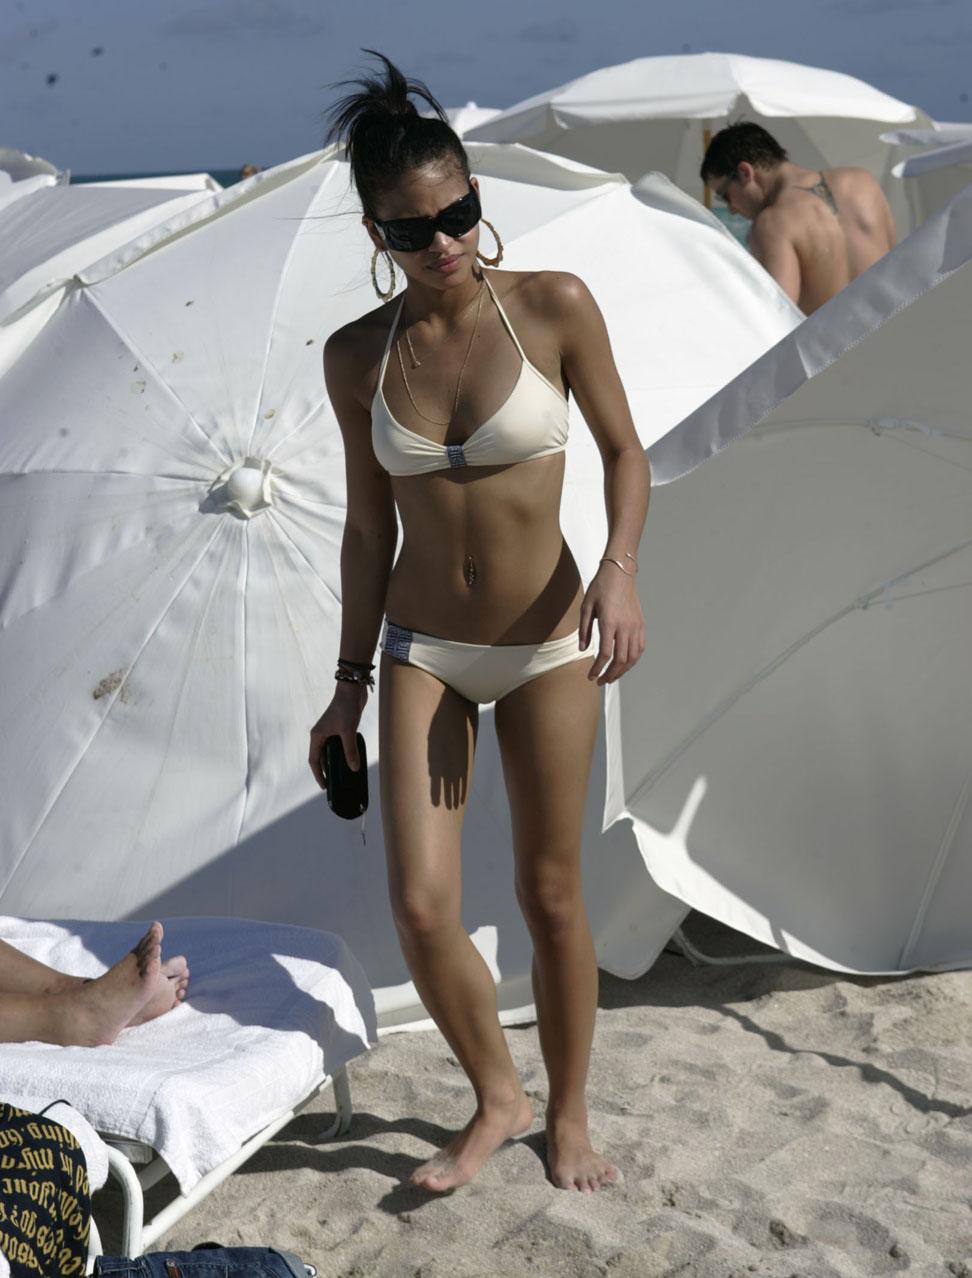 Love cassie ventura bikini pics wish was